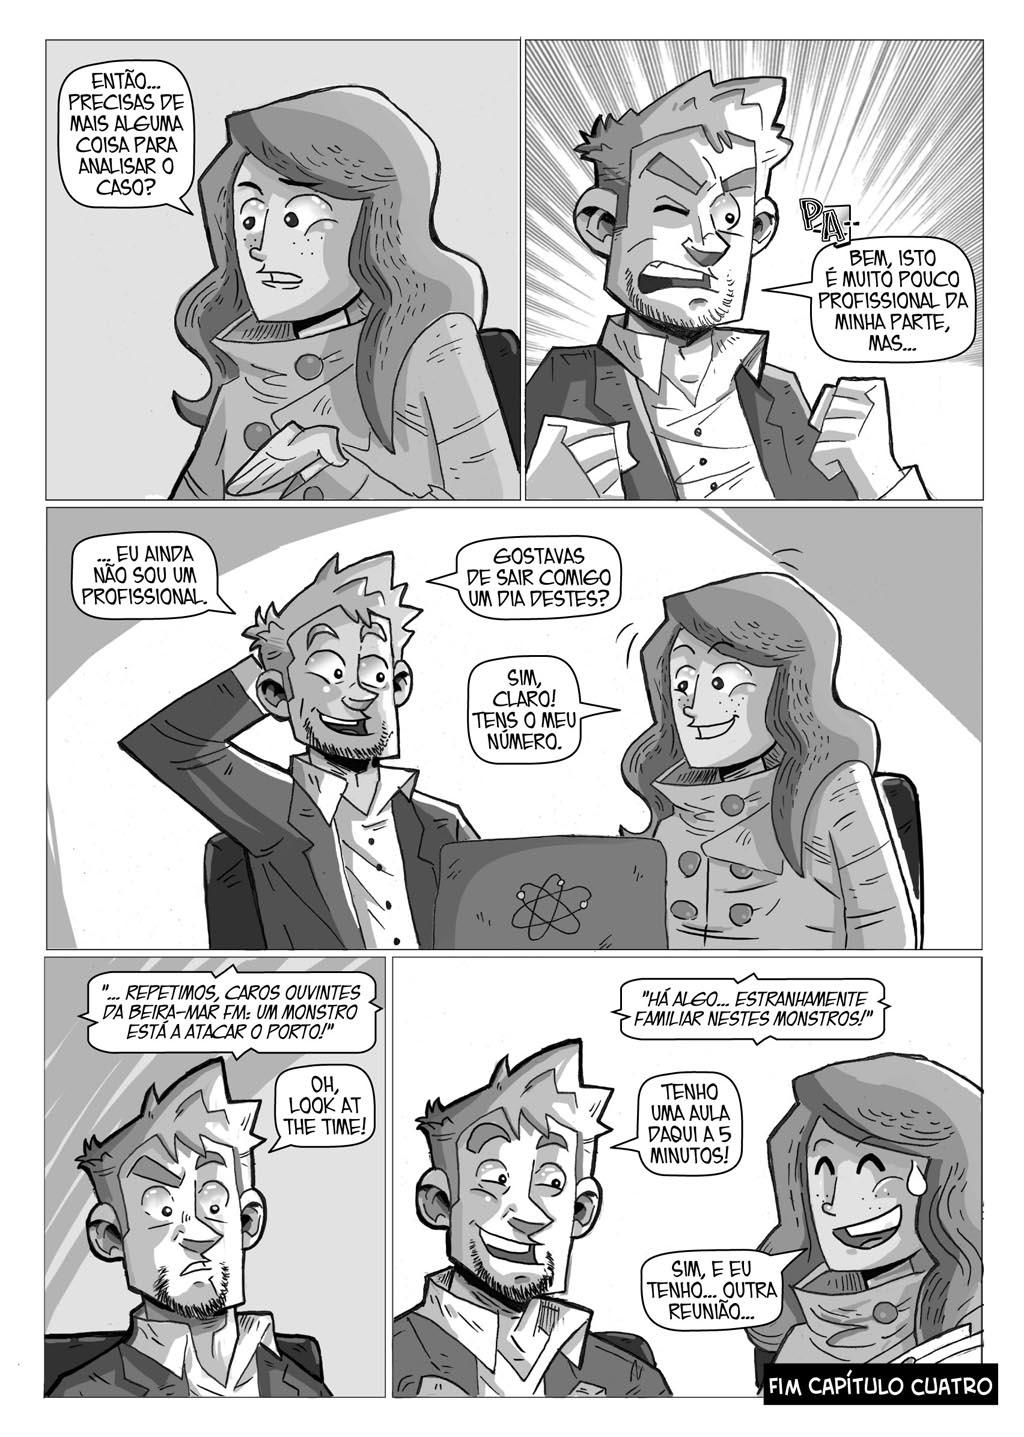 Portento - Página 25